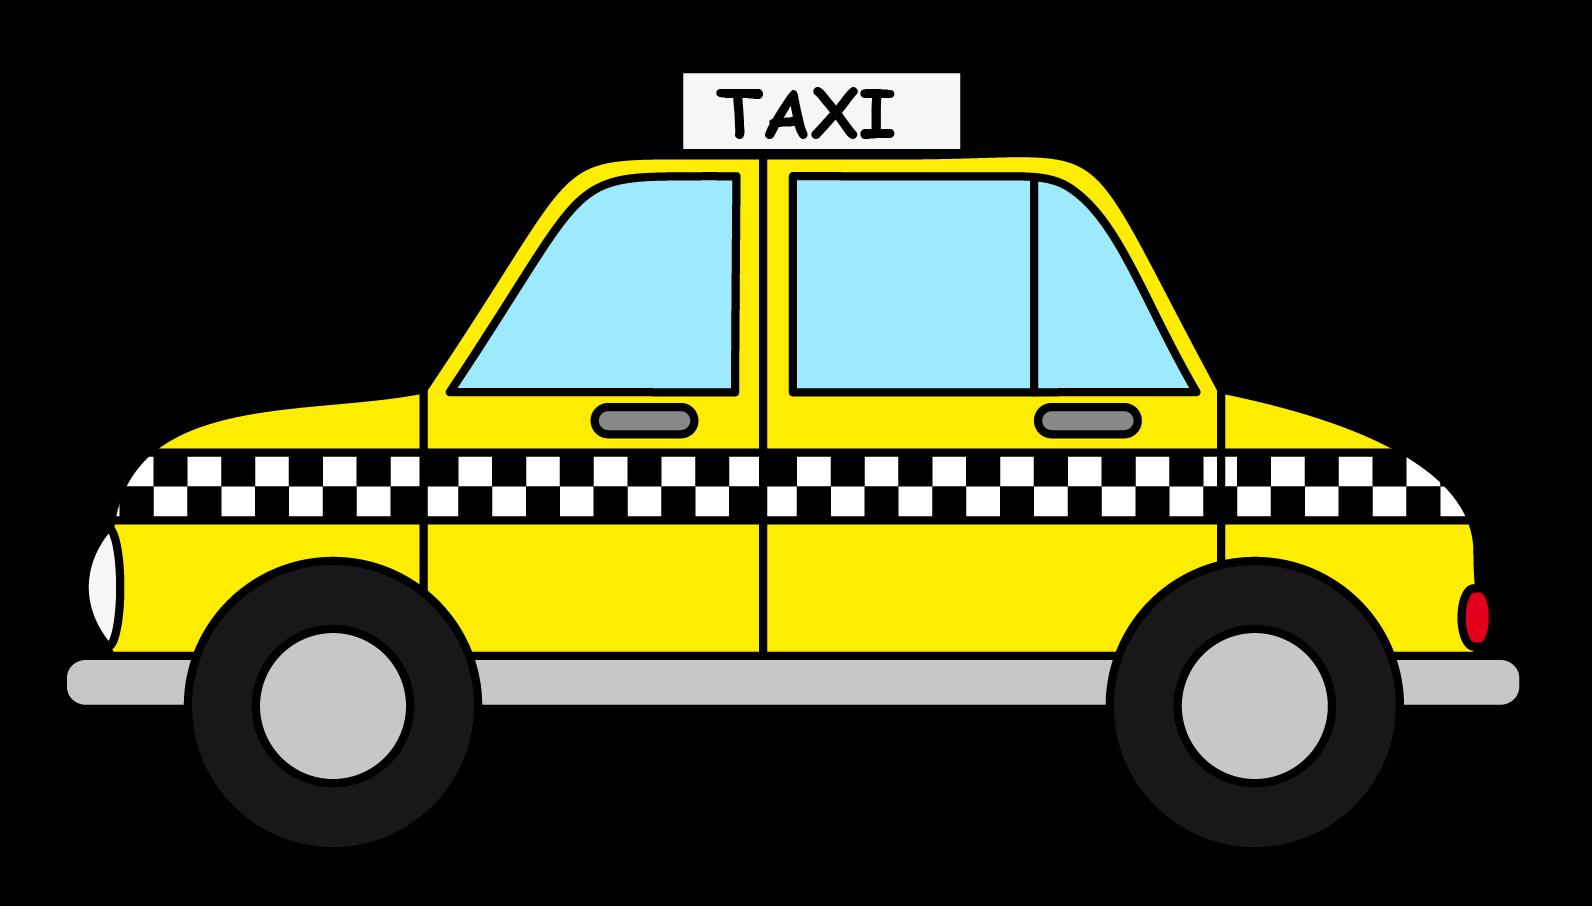 clip art free Transportation at getdrawings com. Taxi drawing.